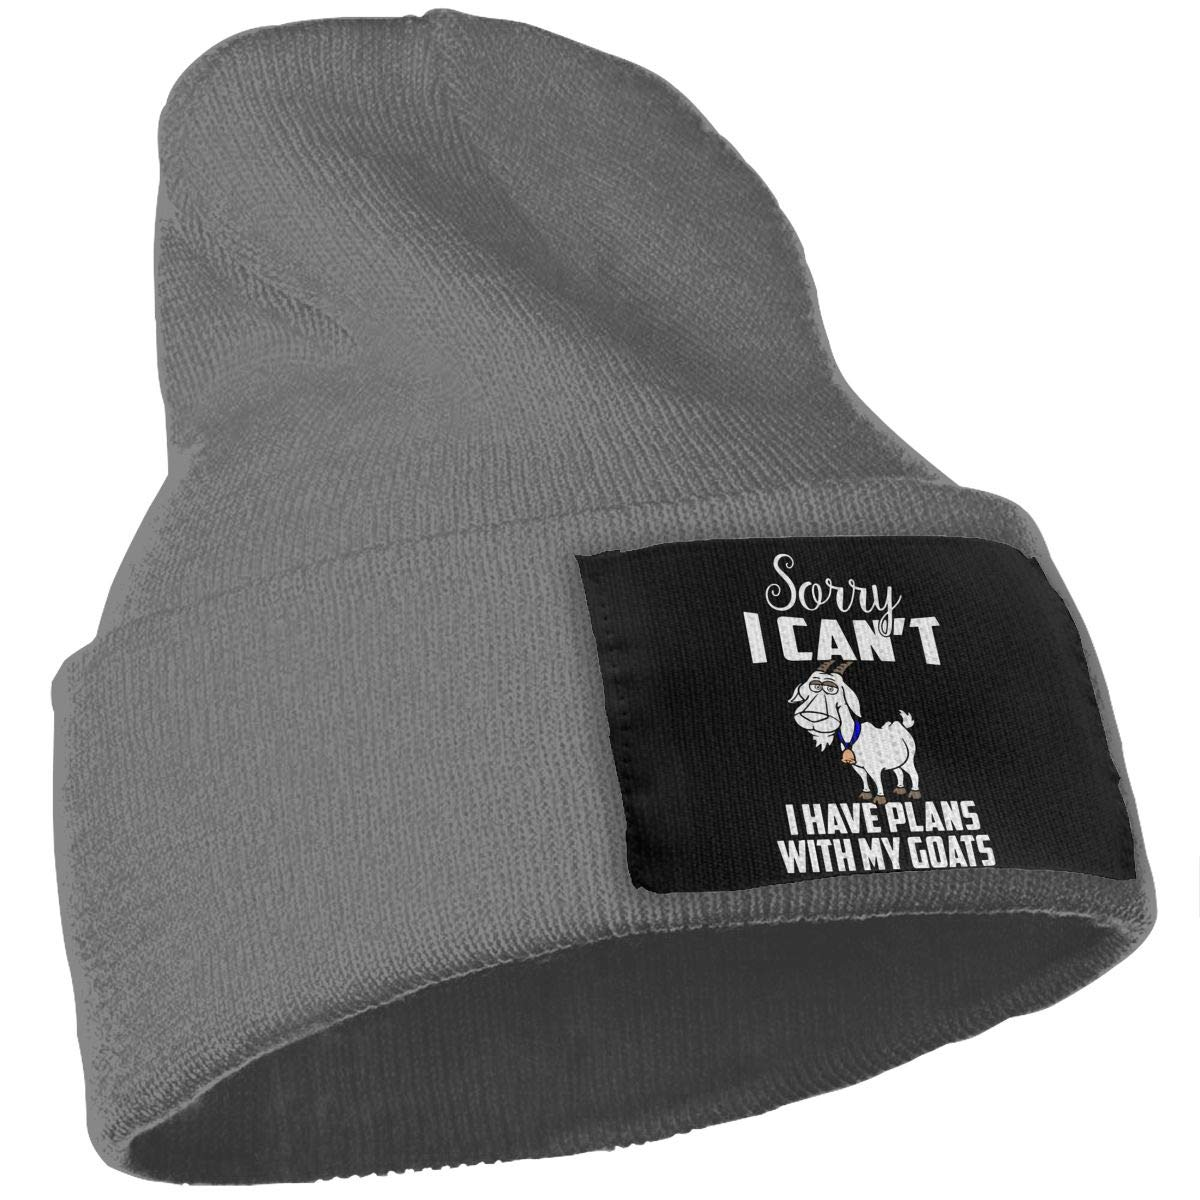 WHOO93@Y Unisex 100/% Acrylic Knit Hat Cap Goats Make Me Happy Fashion Ski Cap